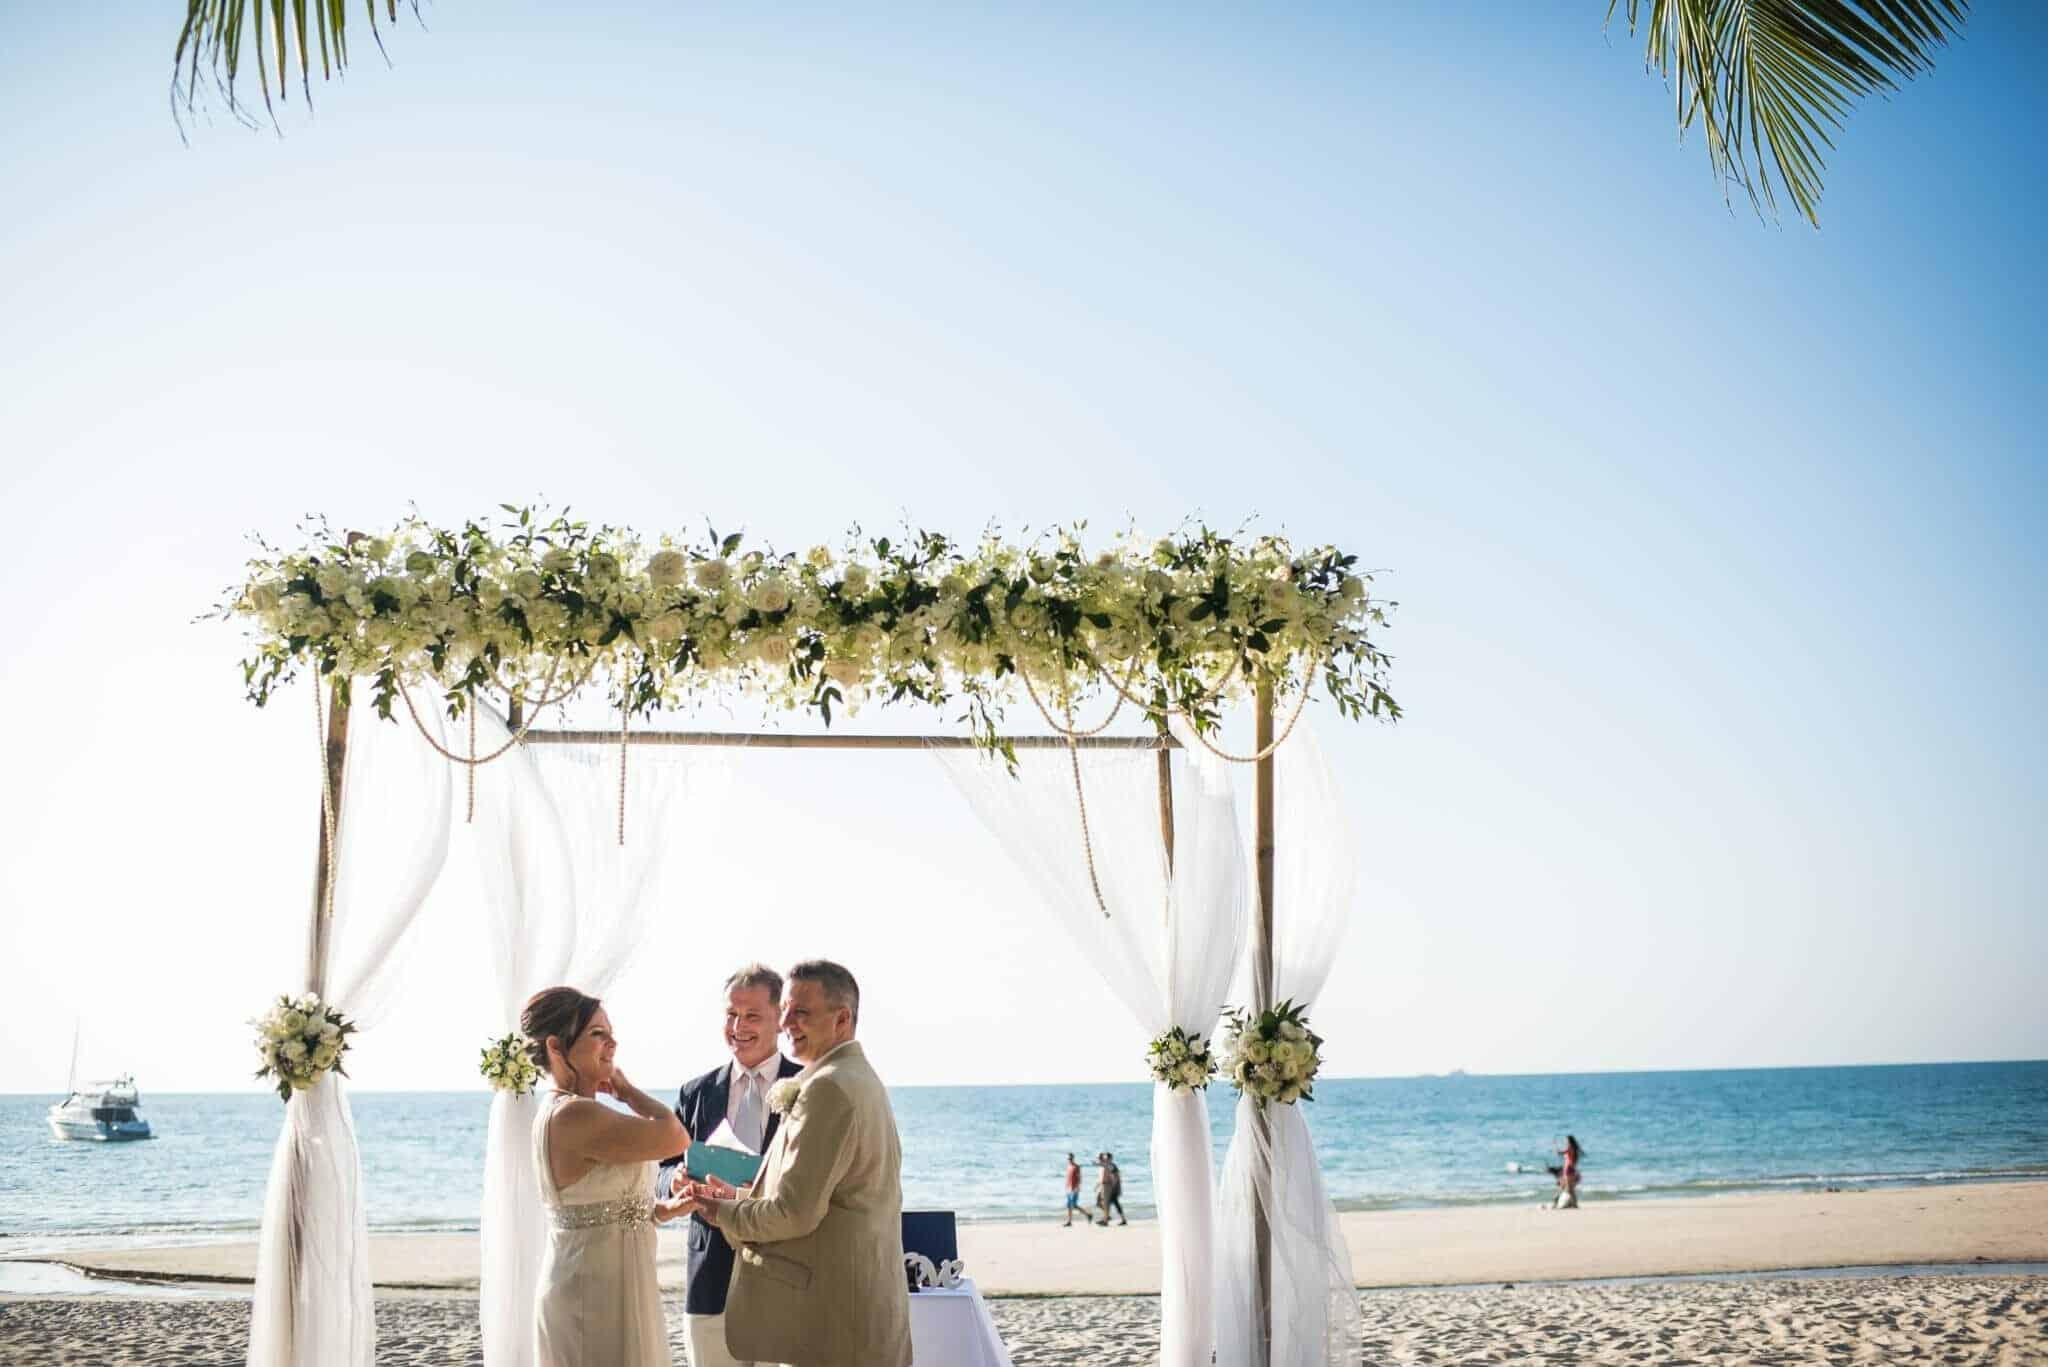 Phuket beach wedding celebrant (14)